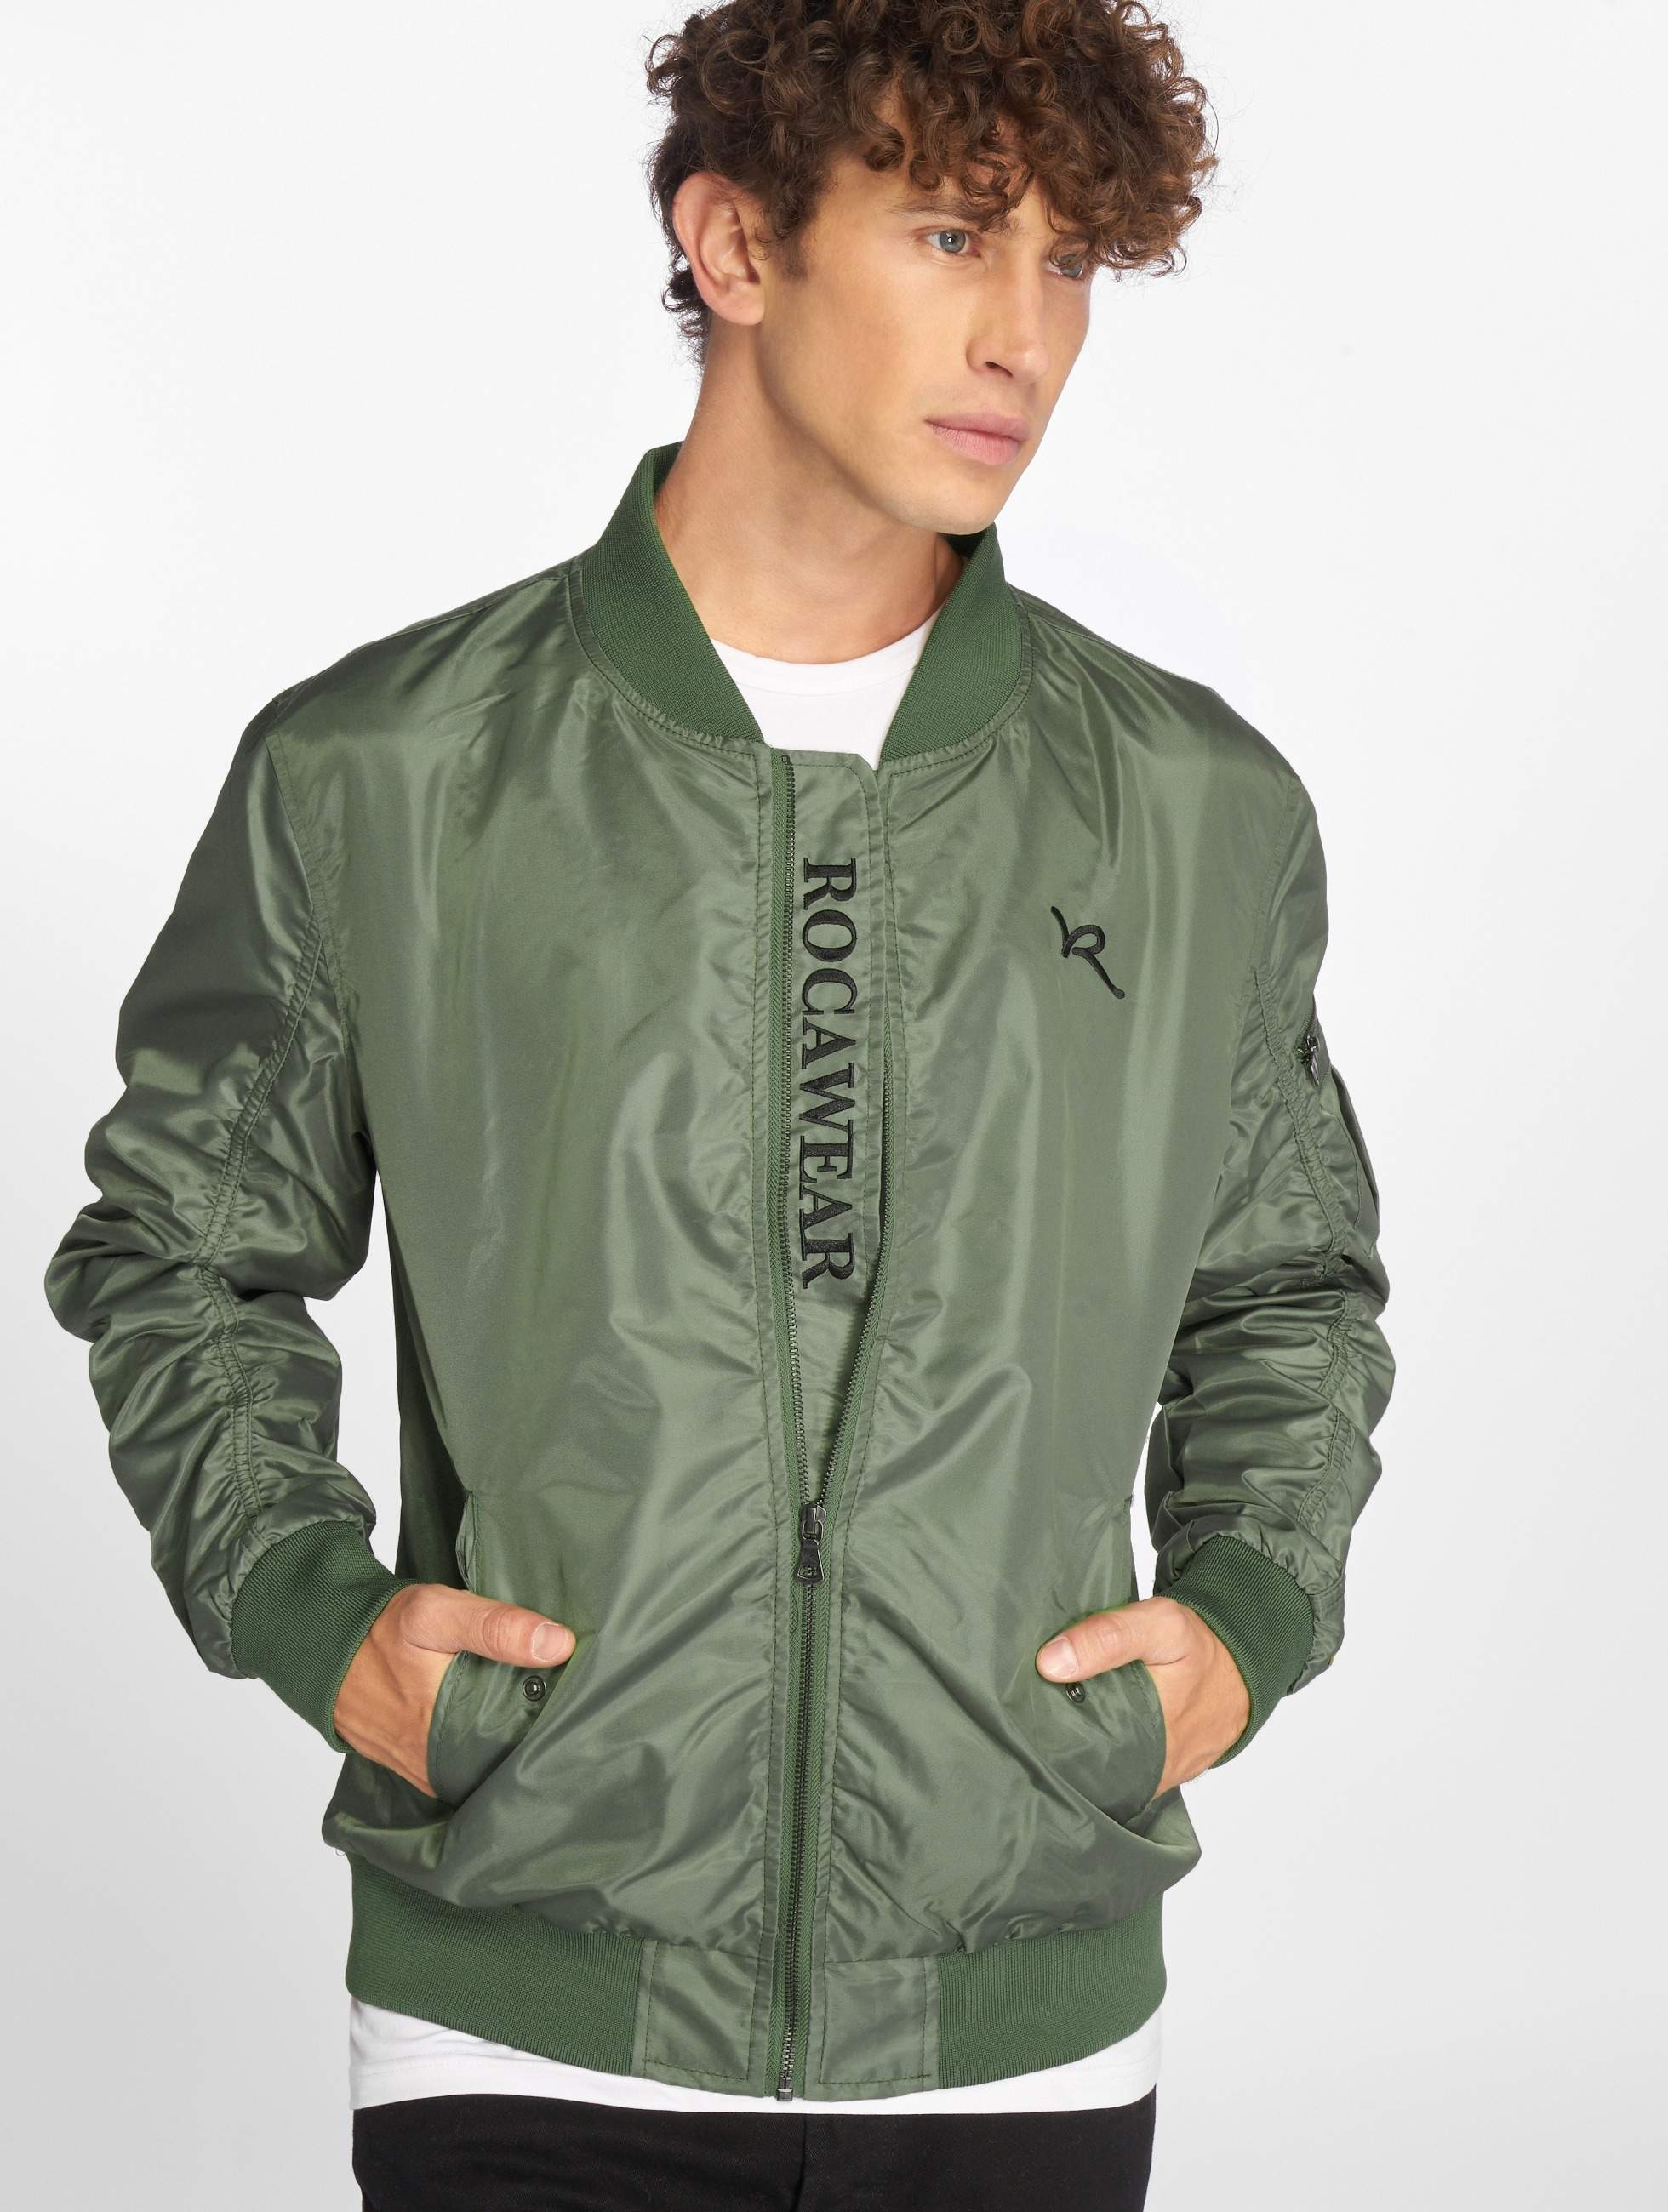 Rocawear / Bomber jacket Dariusz in olive S